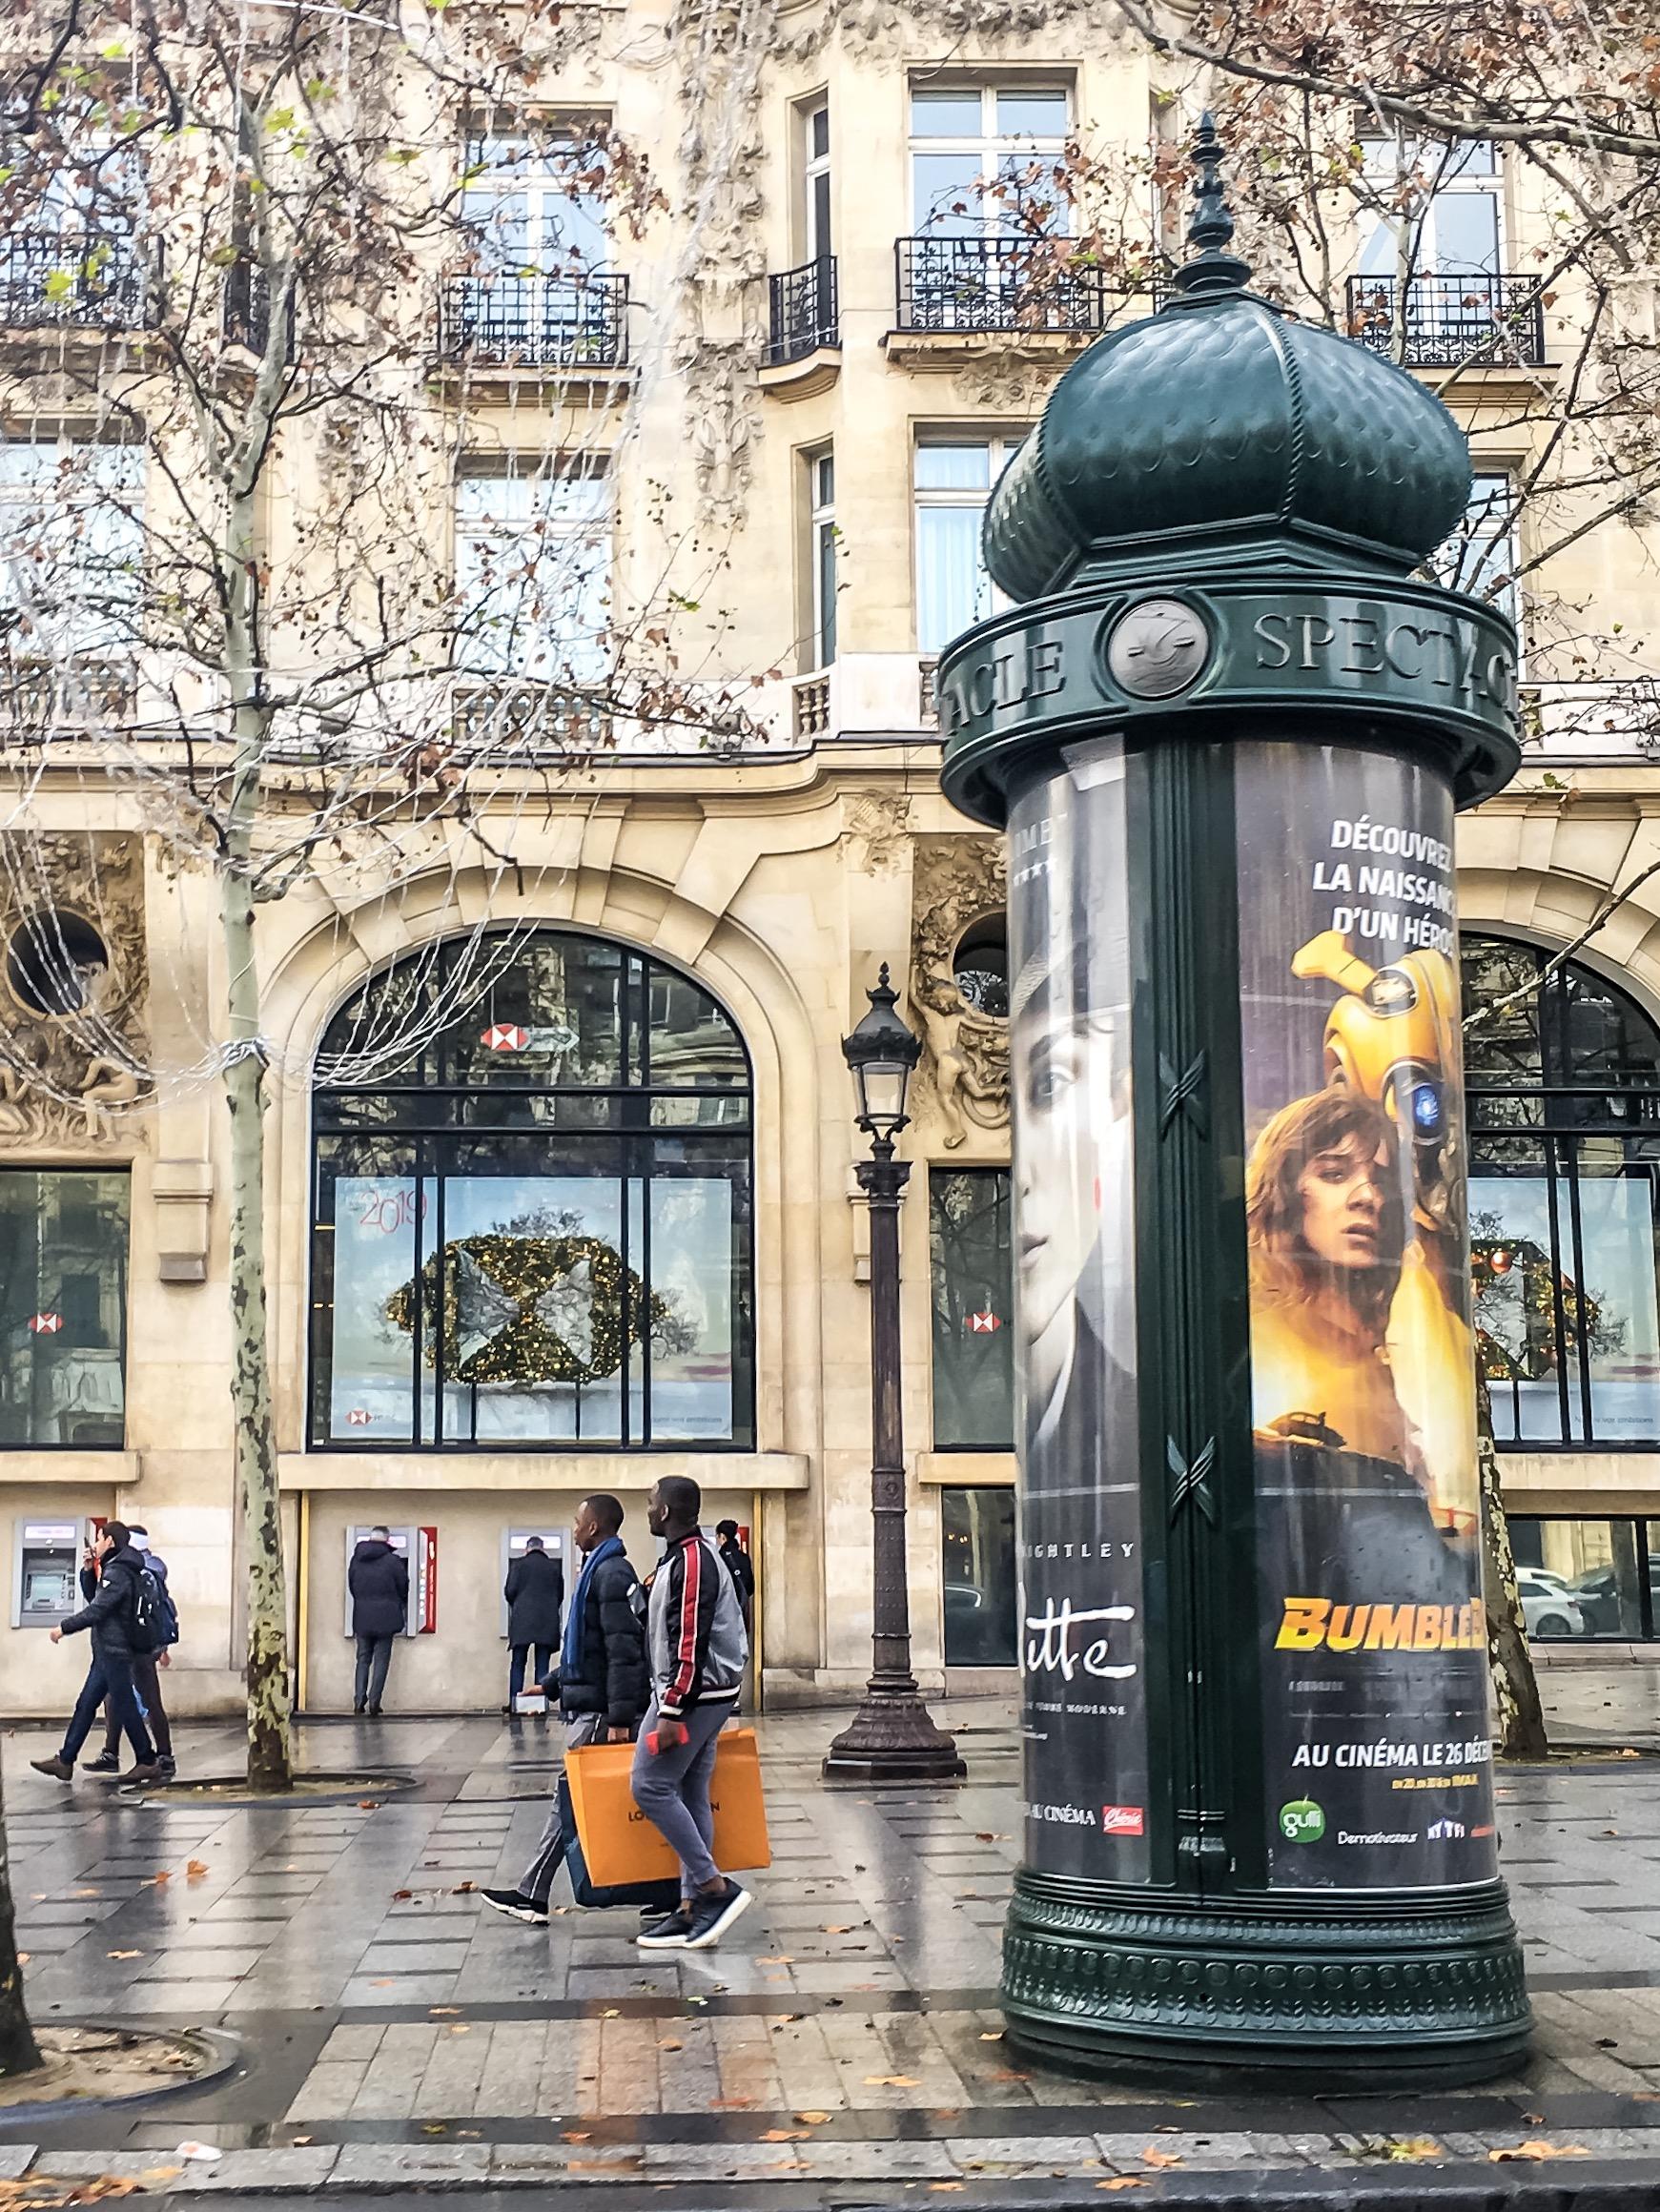 Colonnes Morris - paryskie słupy reklamowe obklejone plakatami